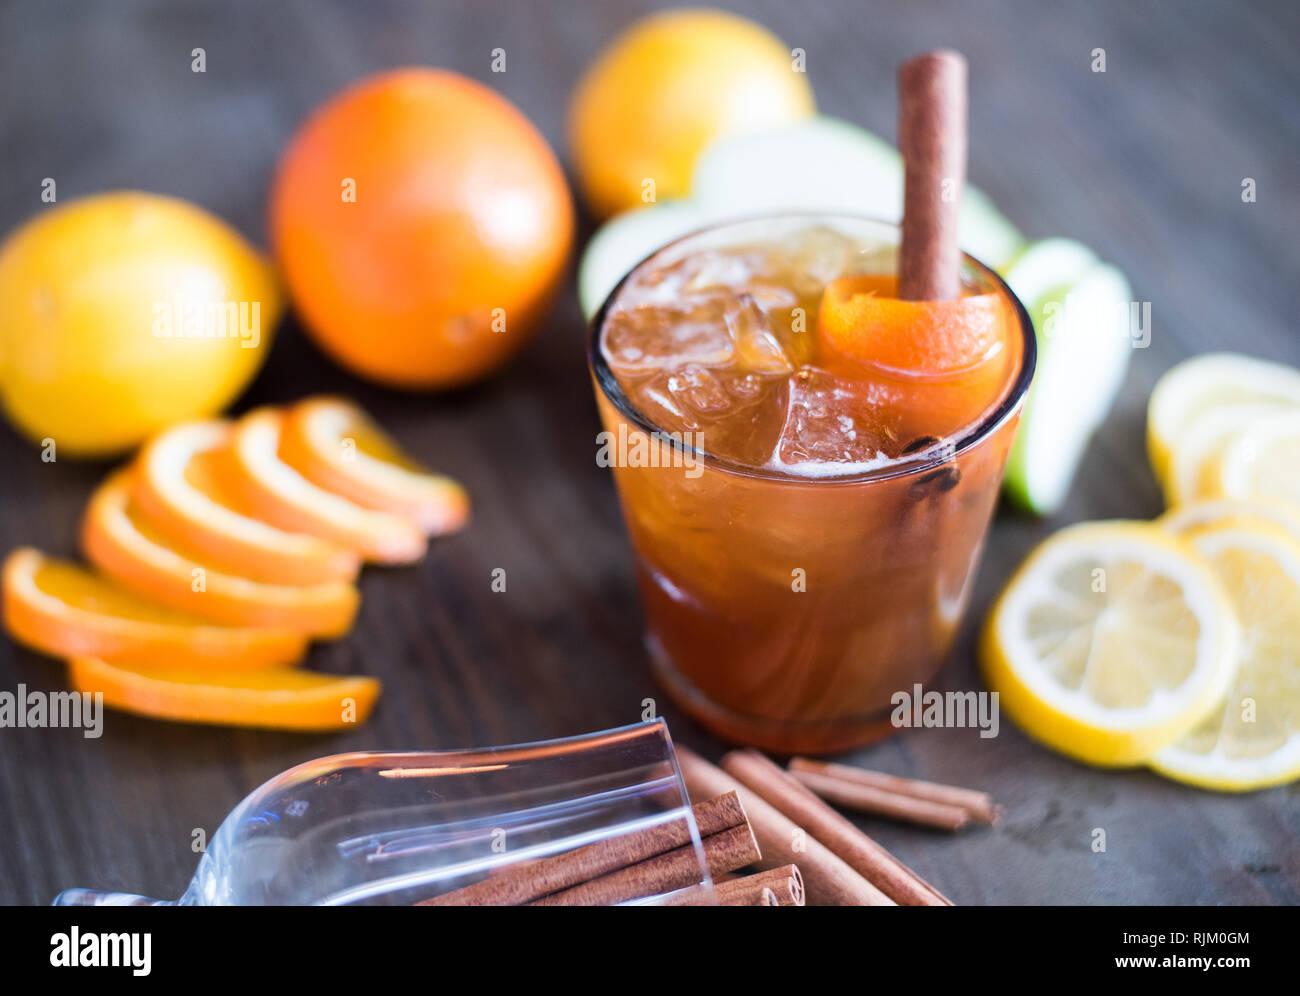 Lust auf Handarbeit Cocktail Stockfoto